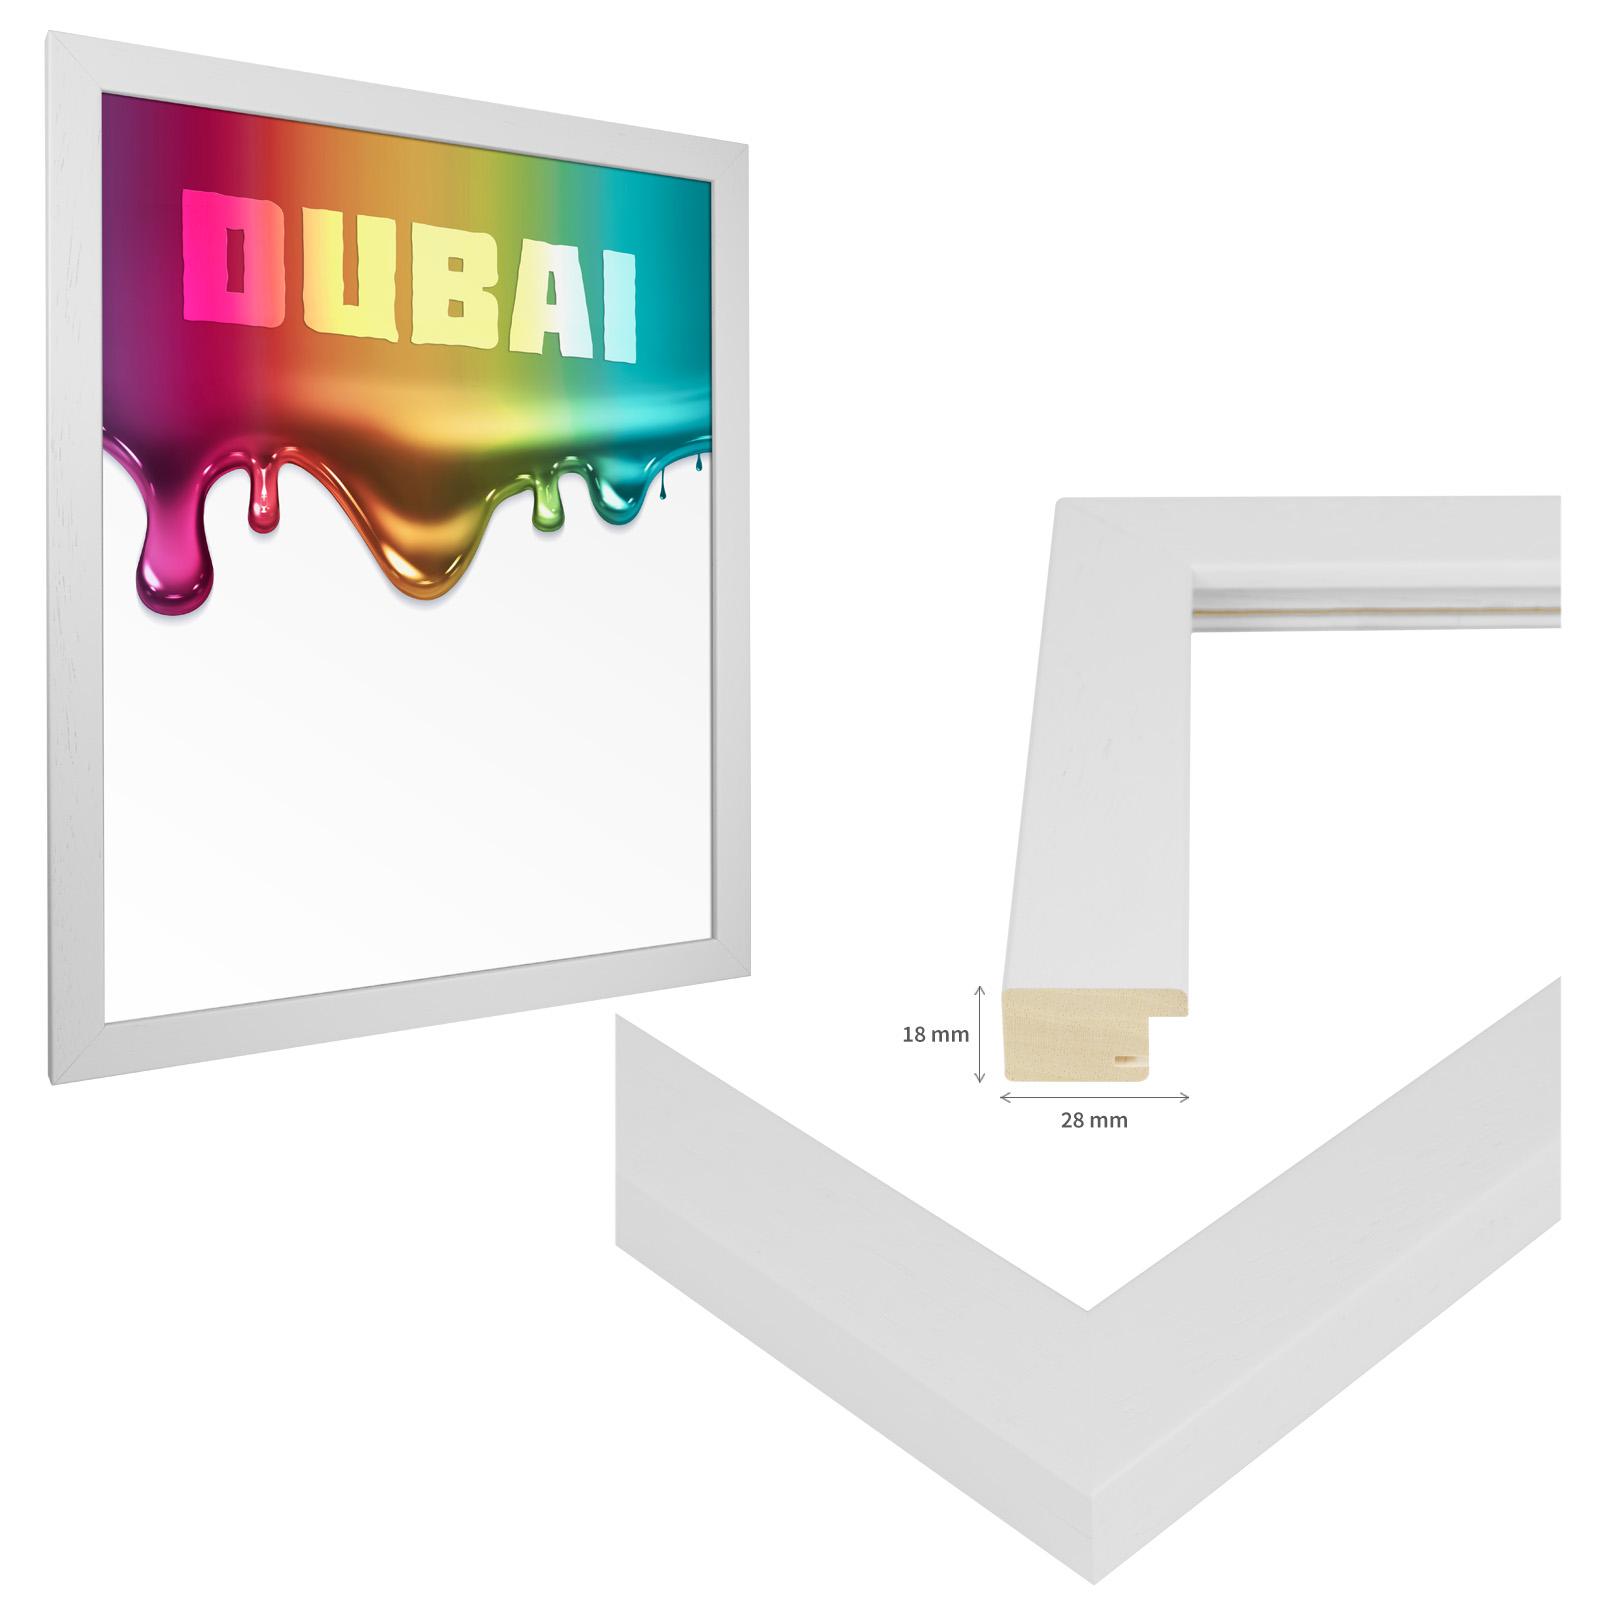 bilderrahmen massiv echt holz lackiert din a2 42 x 59 4 cm 6 farben foto poster ebay. Black Bedroom Furniture Sets. Home Design Ideas